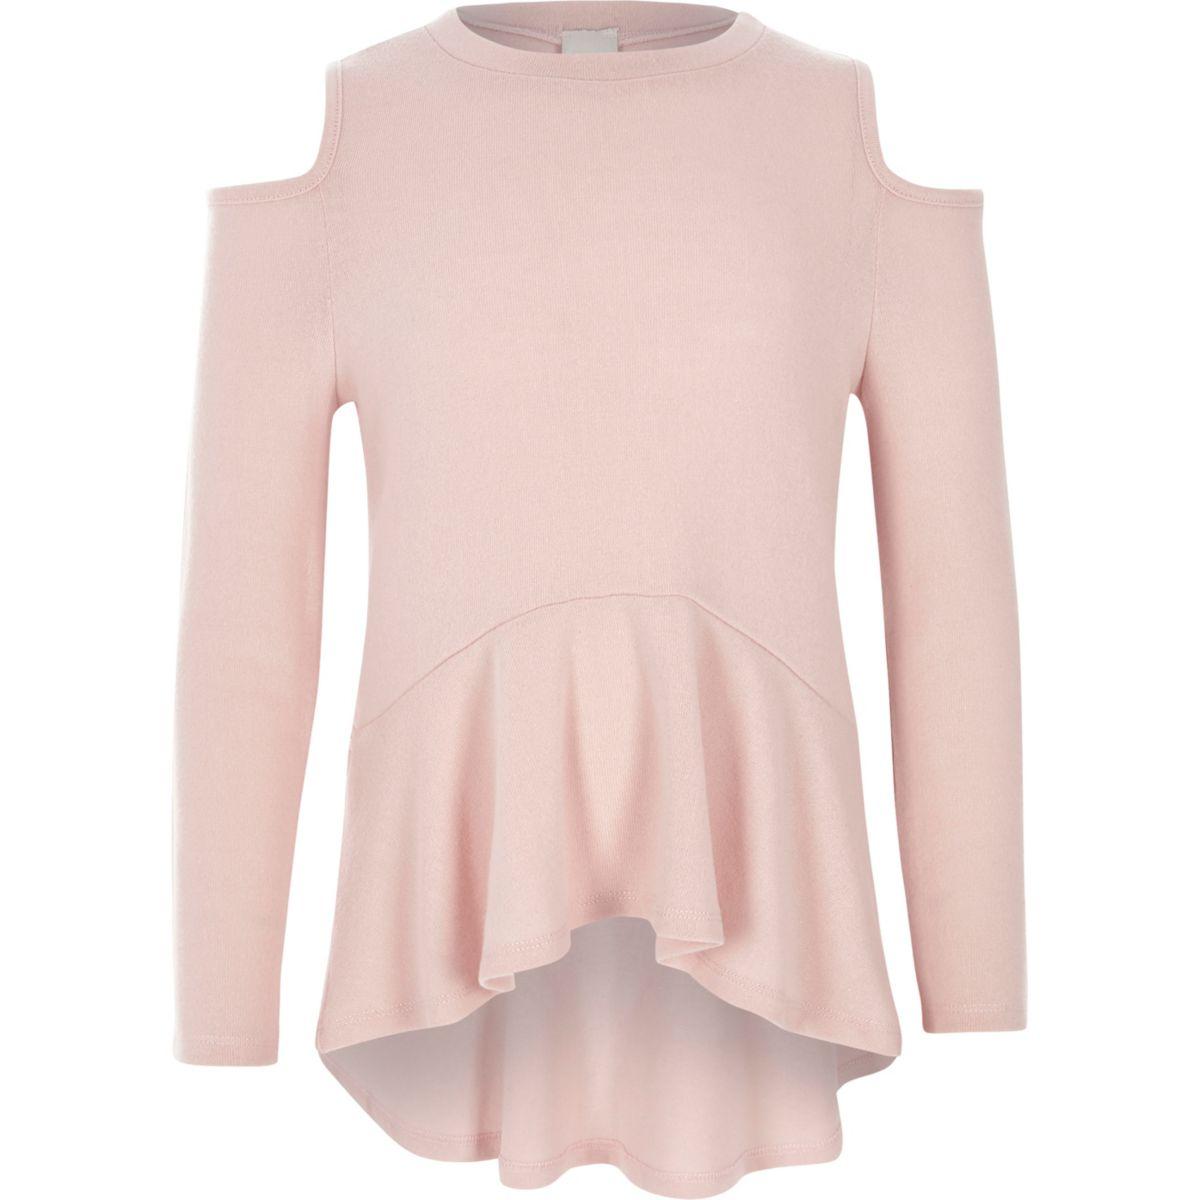 Girls pink cold shoulder peplum sweater